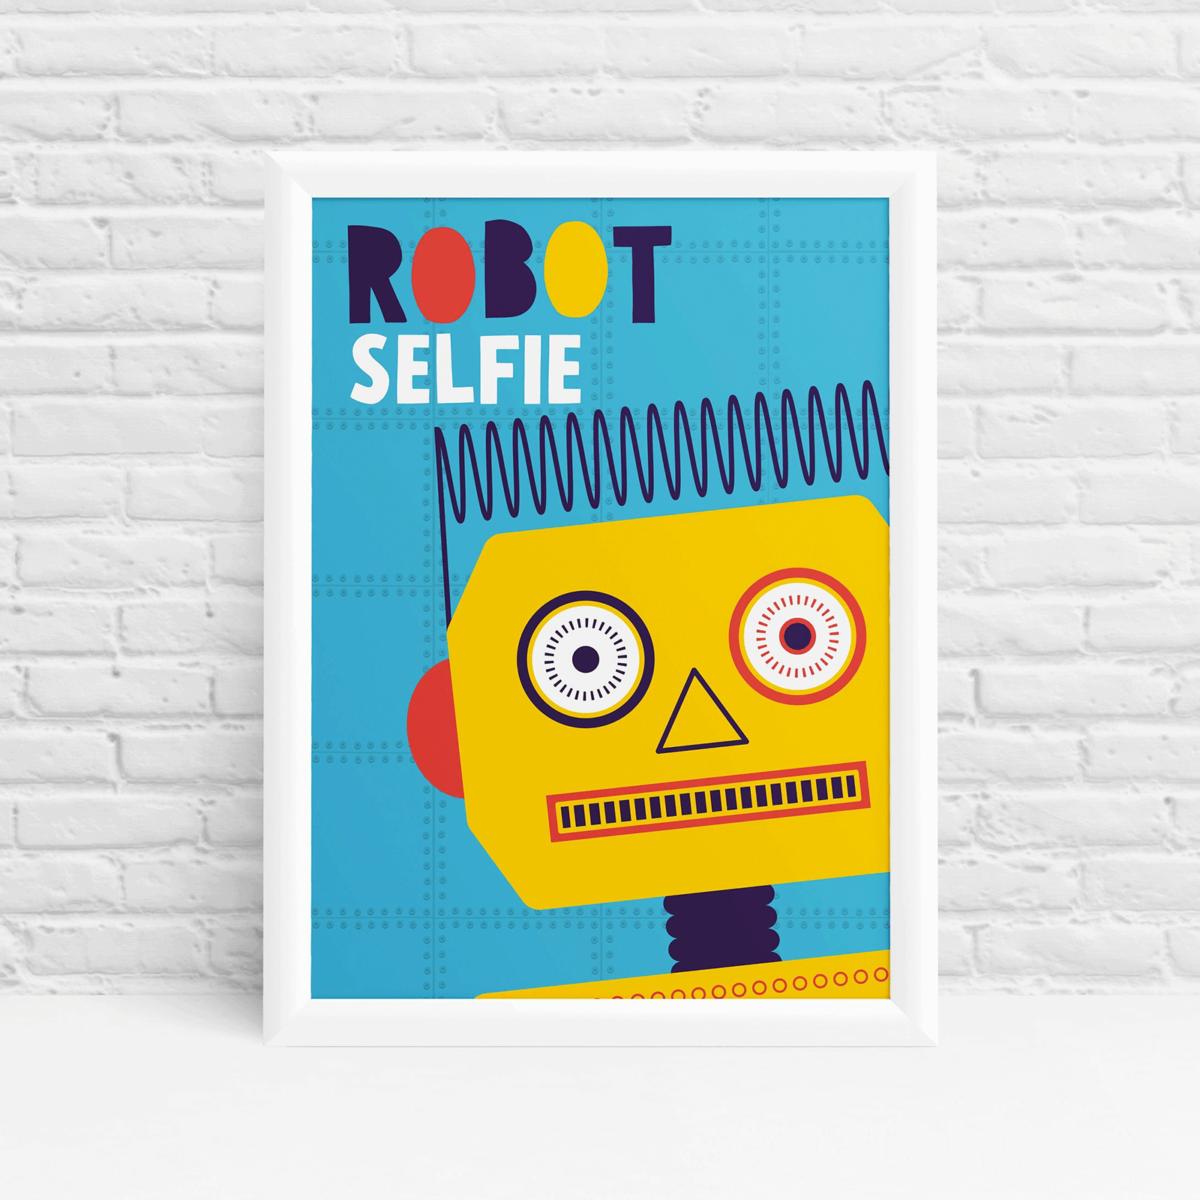 Robot selfie yellow original fun wall art by Ibbleobble®